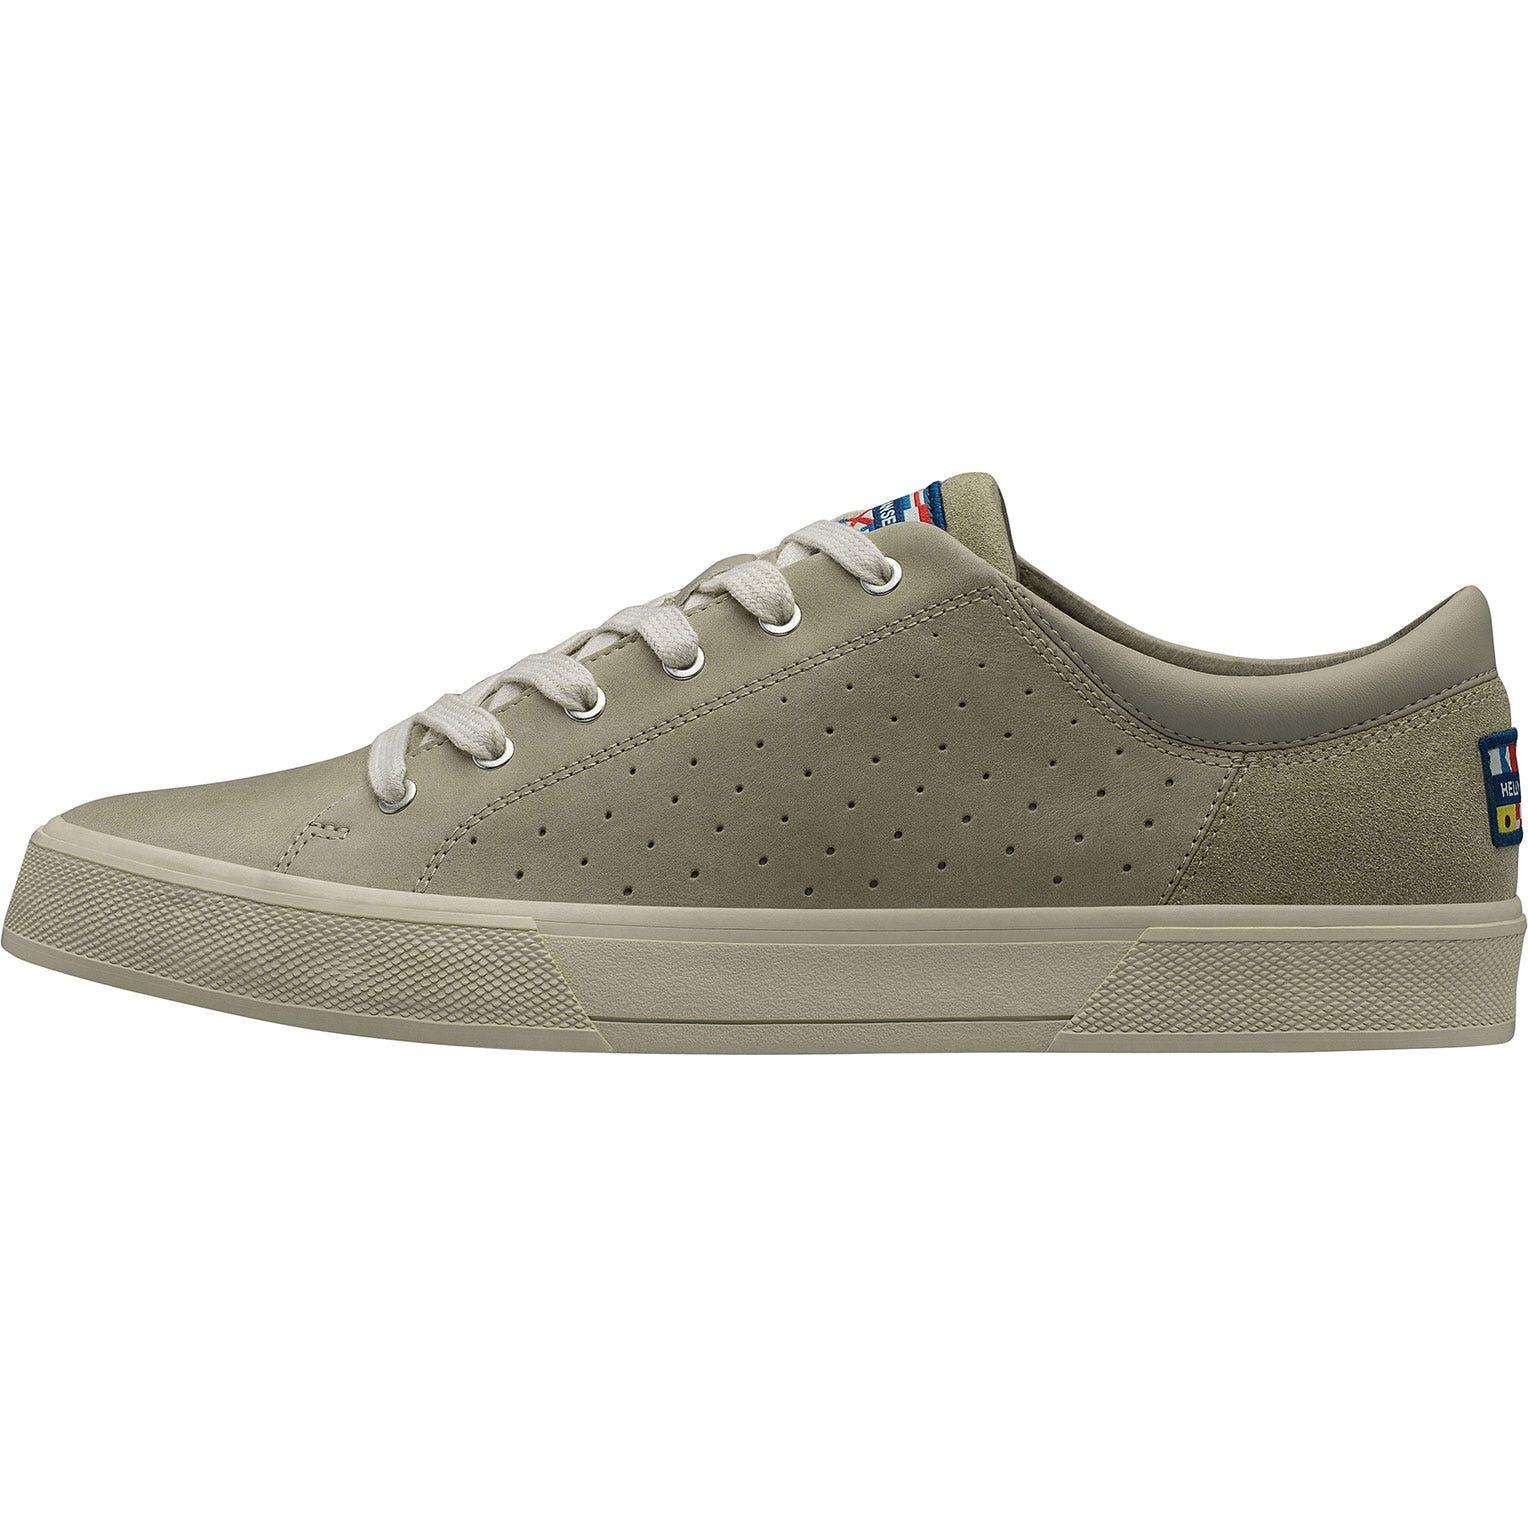 Helly Hansen Copenhagen Leather Shoe Mens Casual Grey 43/9.5